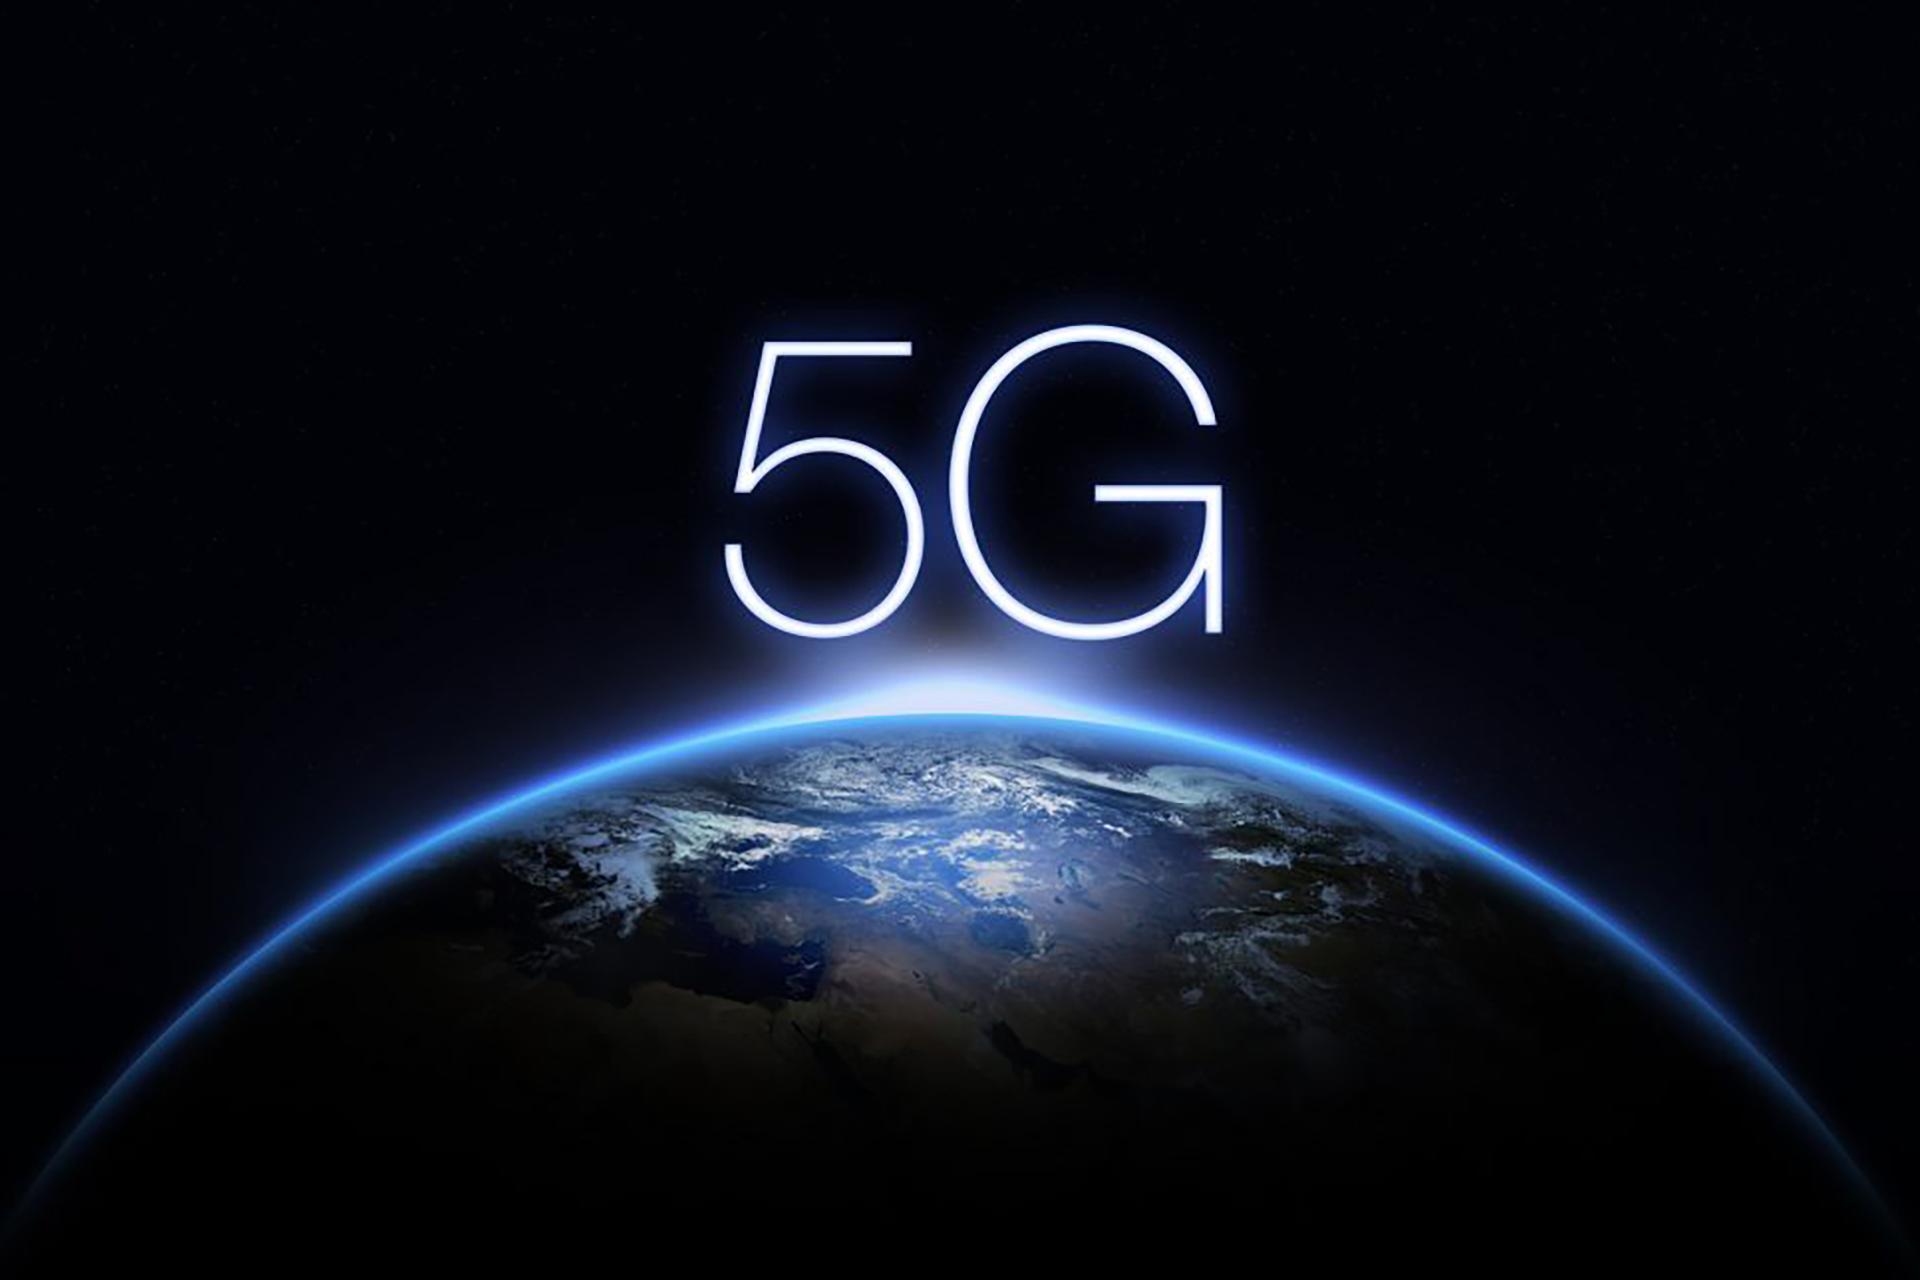 How 5G Will Transform Economy and Society